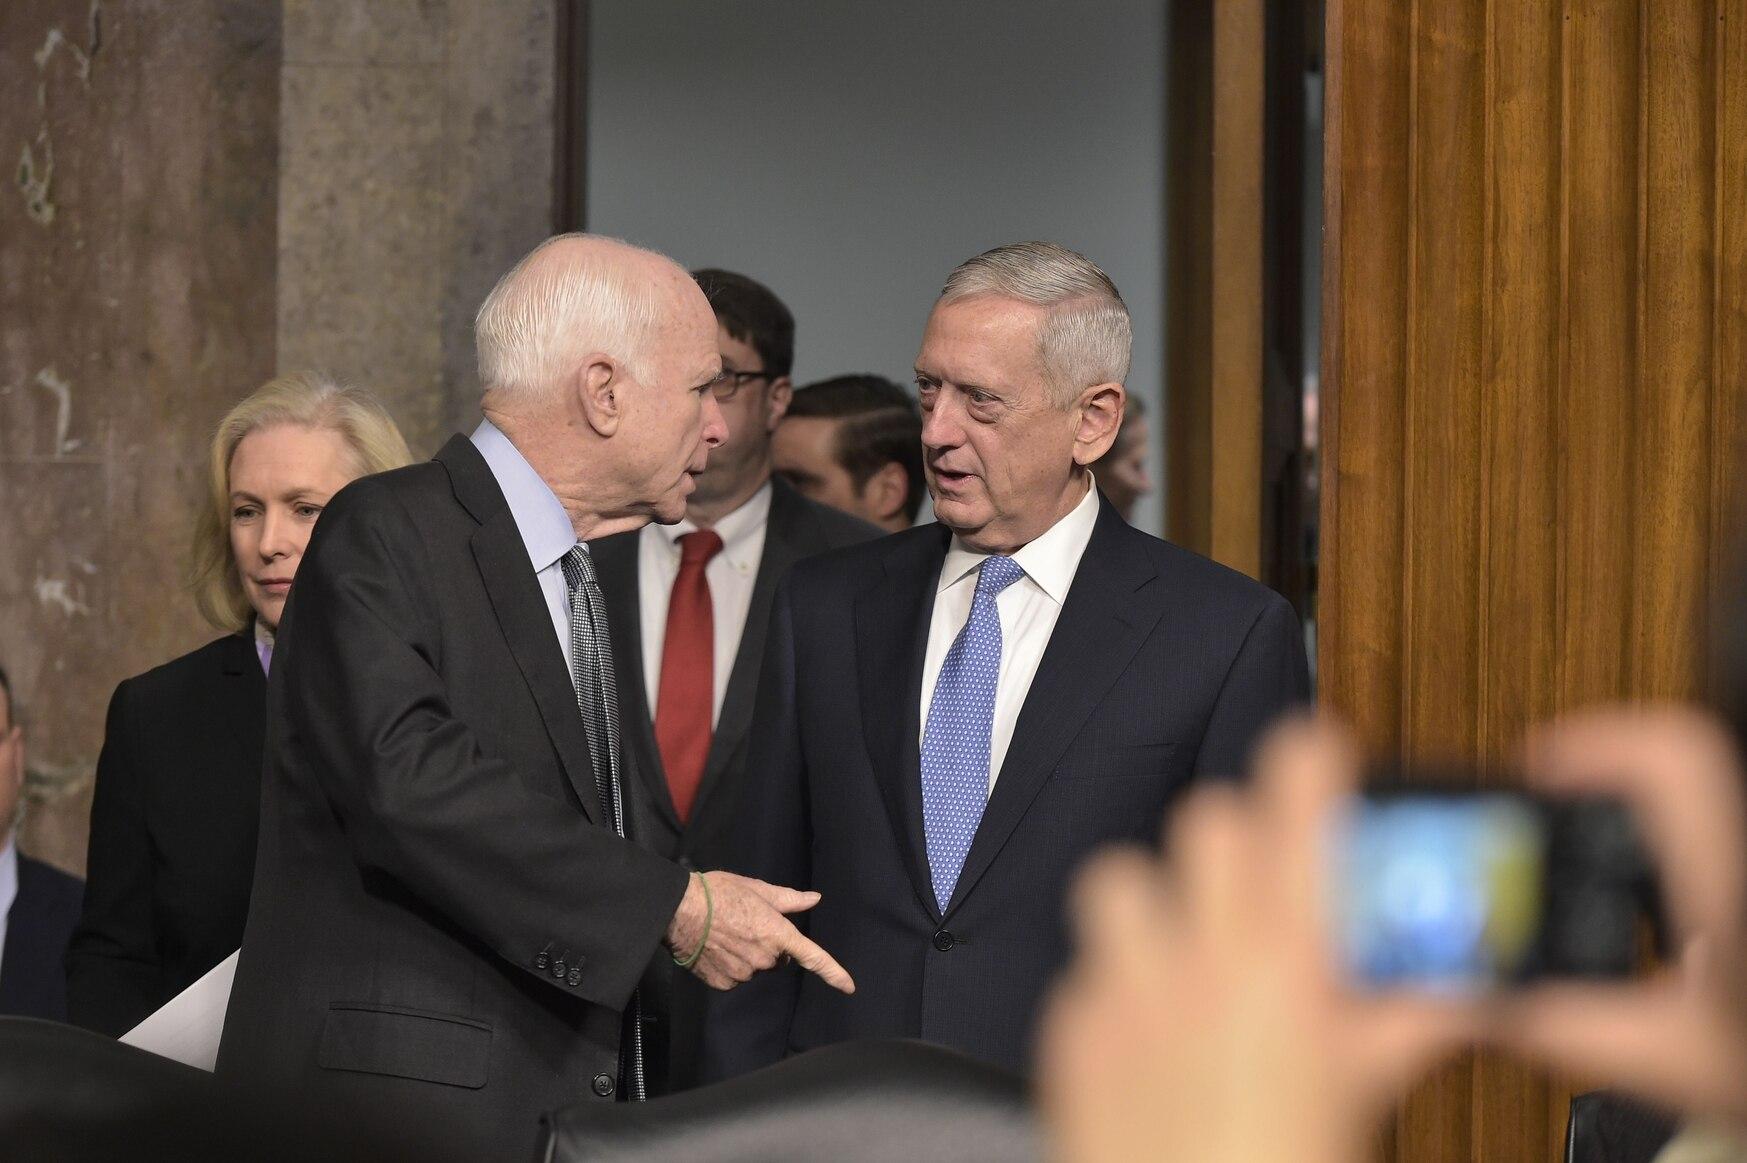 FILE- In this Jan. 12, 2017 file photo, retired Marine Corps general James Mattis speaks to Sen. John McCain (L),R-Ariz., before he testifies before the Senate Armed Services Committee. (Mandel Ngan/AFP/Getty Images)